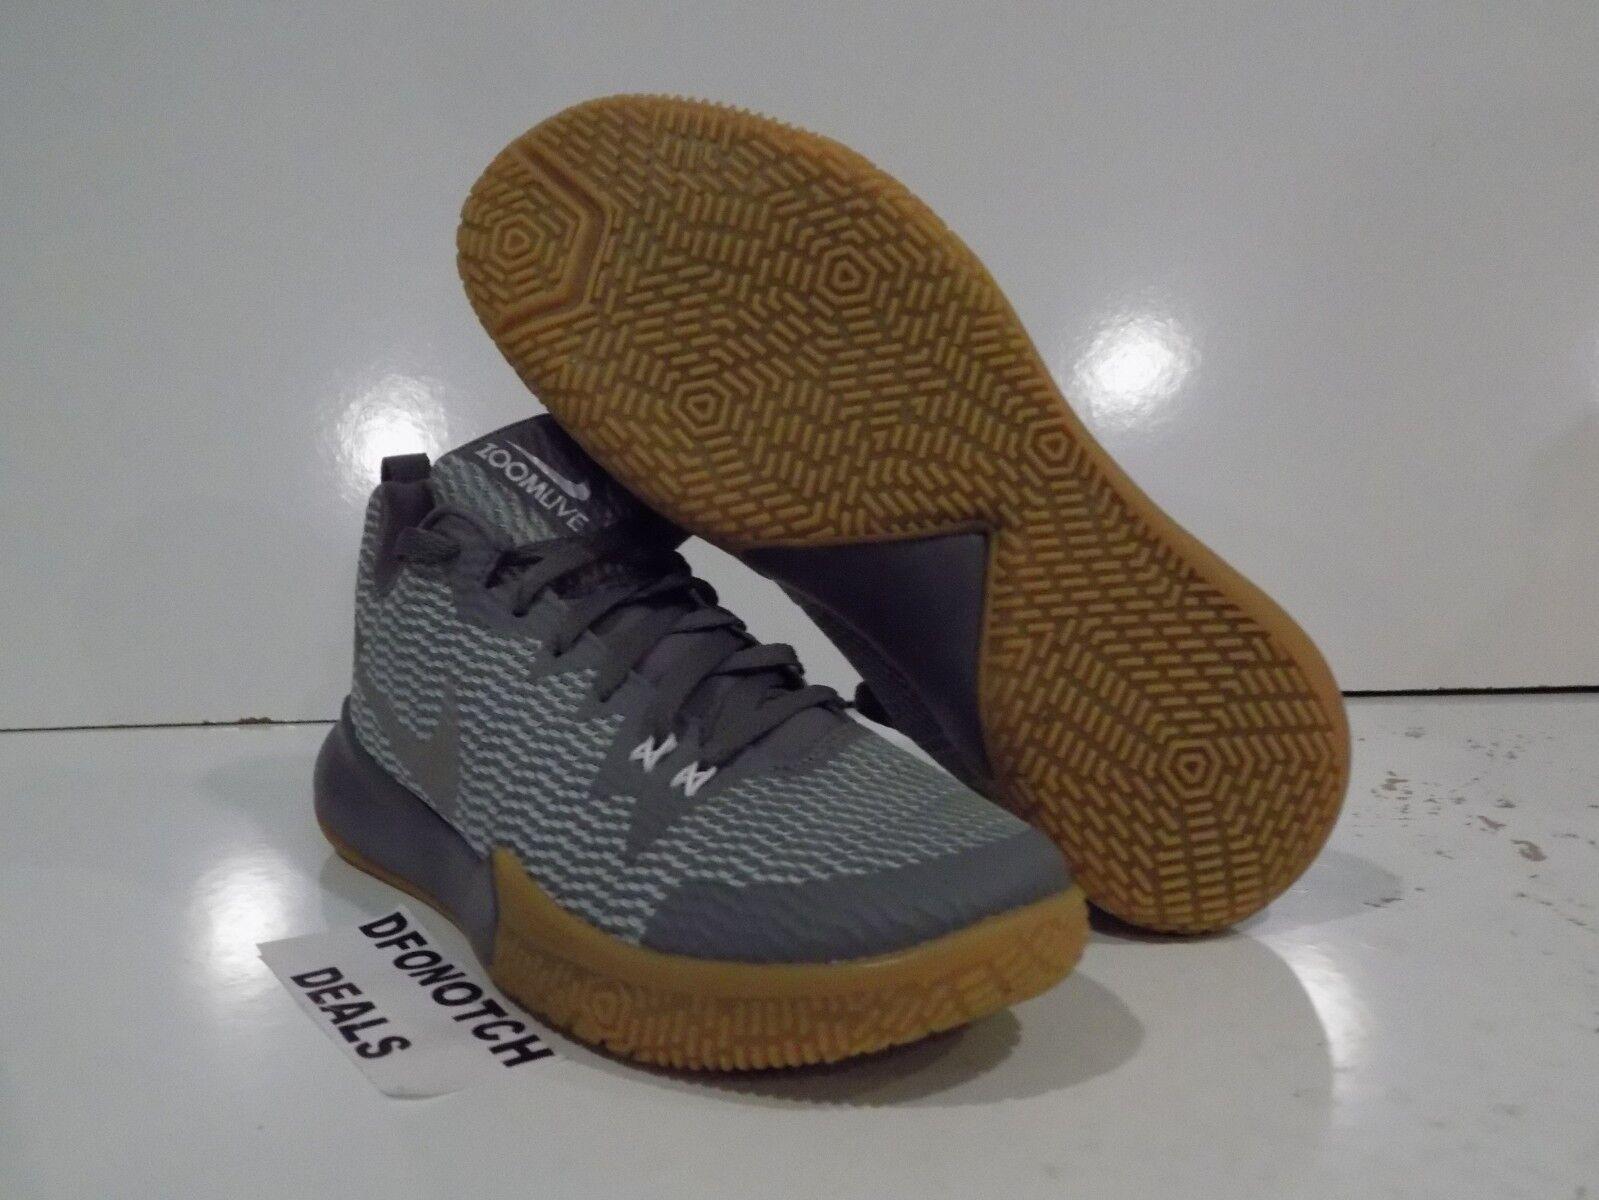 40f156149e9 Nike Zoom Live 2 II Basketball Shoes Sz 10 Grey Reflect Silver Gum ...